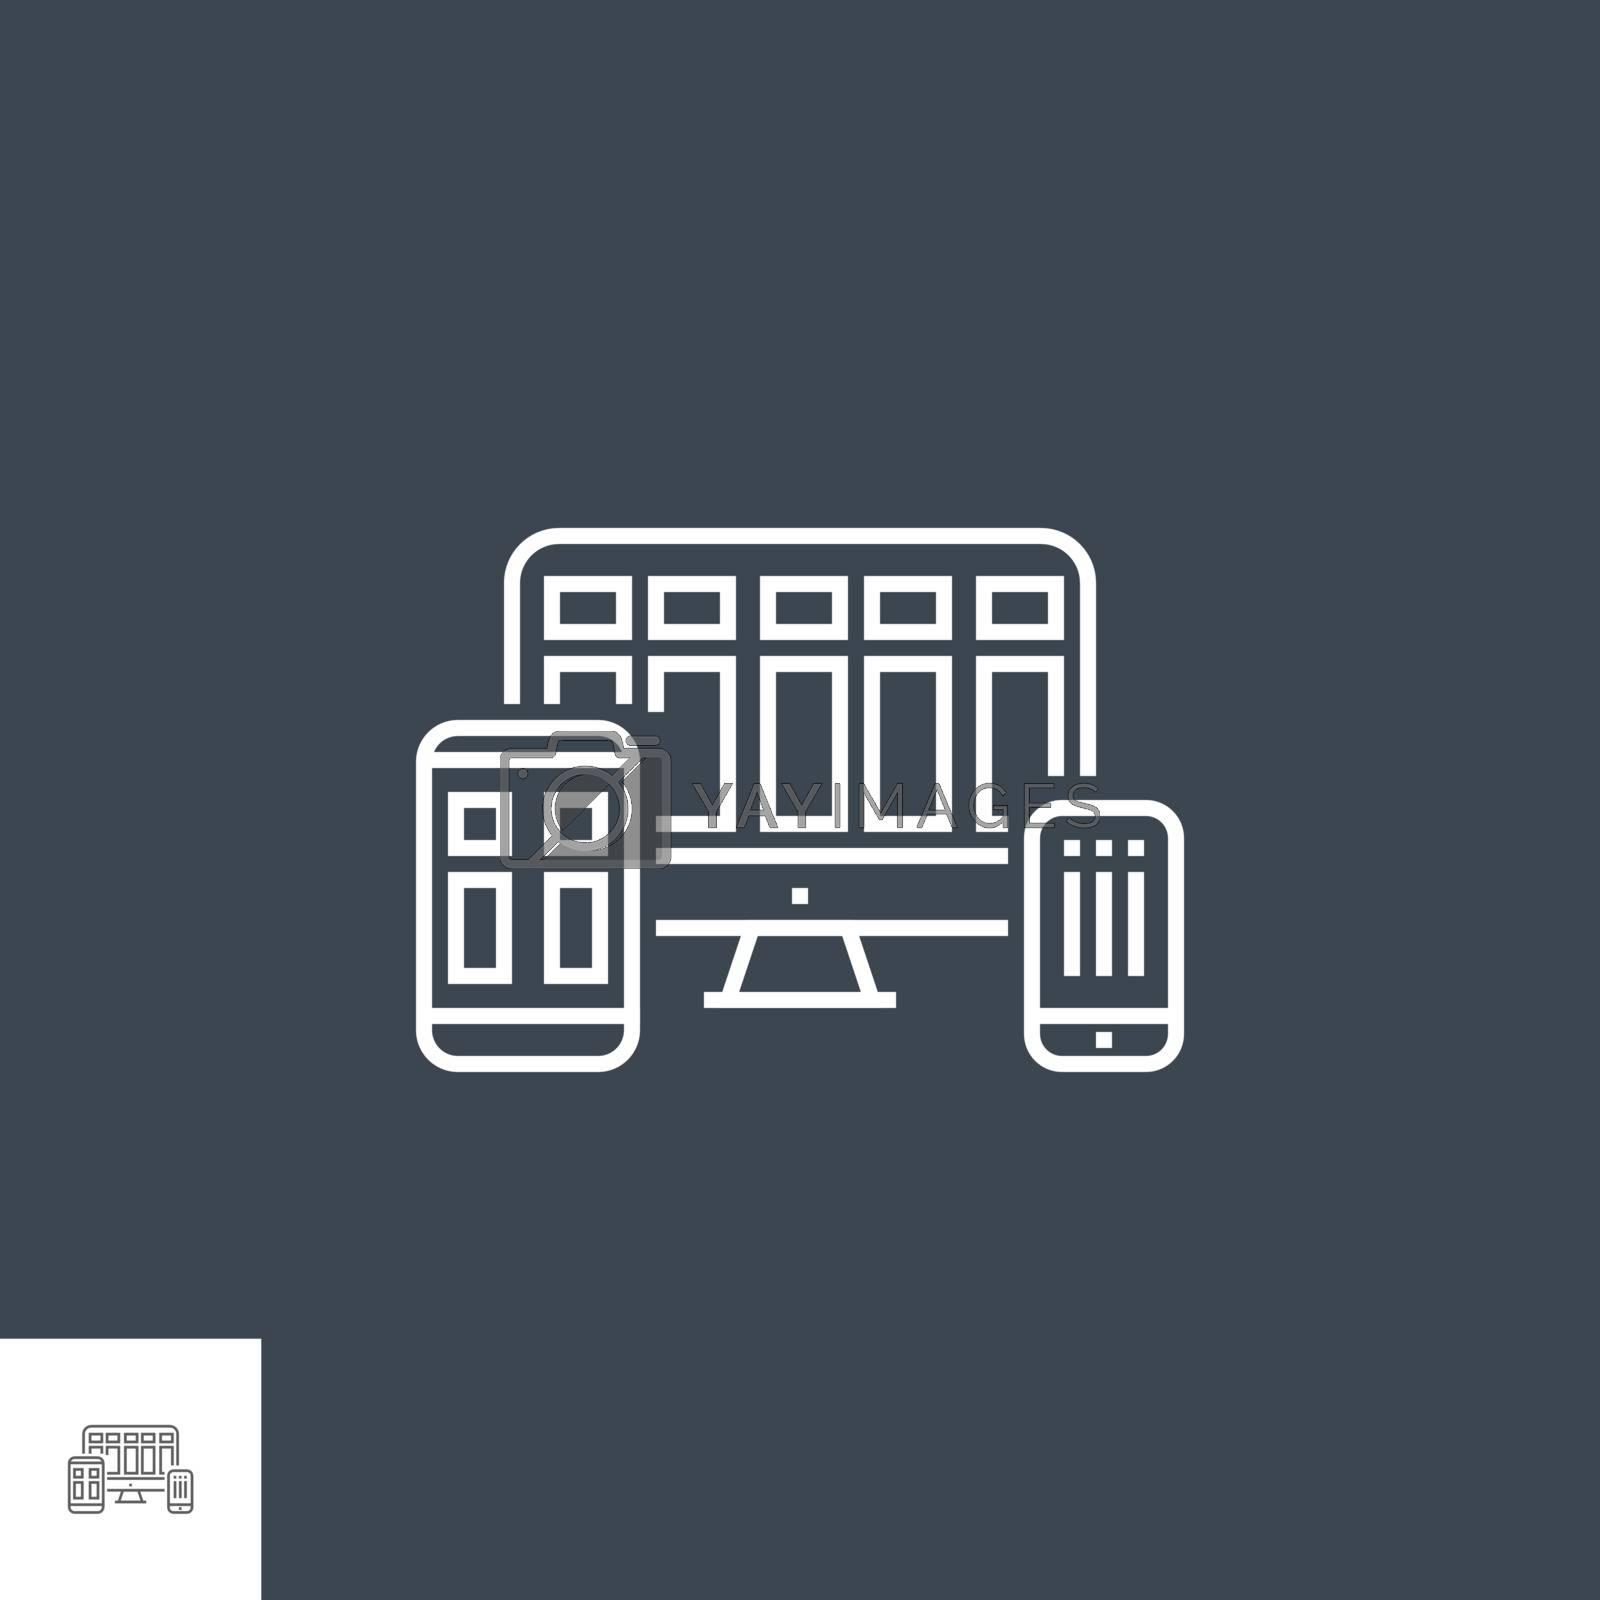 Responsive Web Design Line Icon by smoki